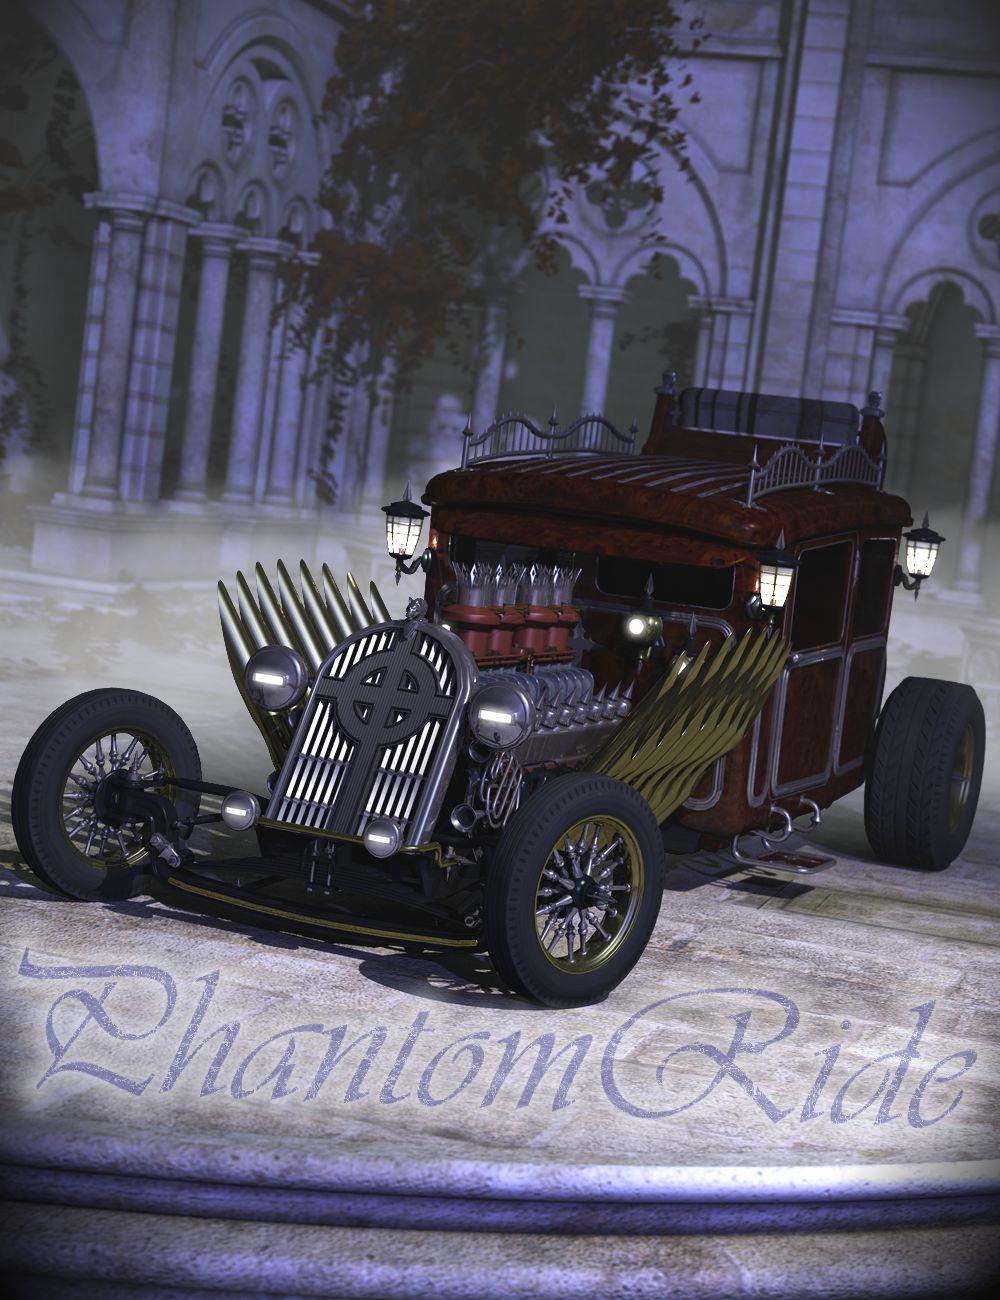 Phantom Ride by: DzFire, 3D Models by Daz 3D